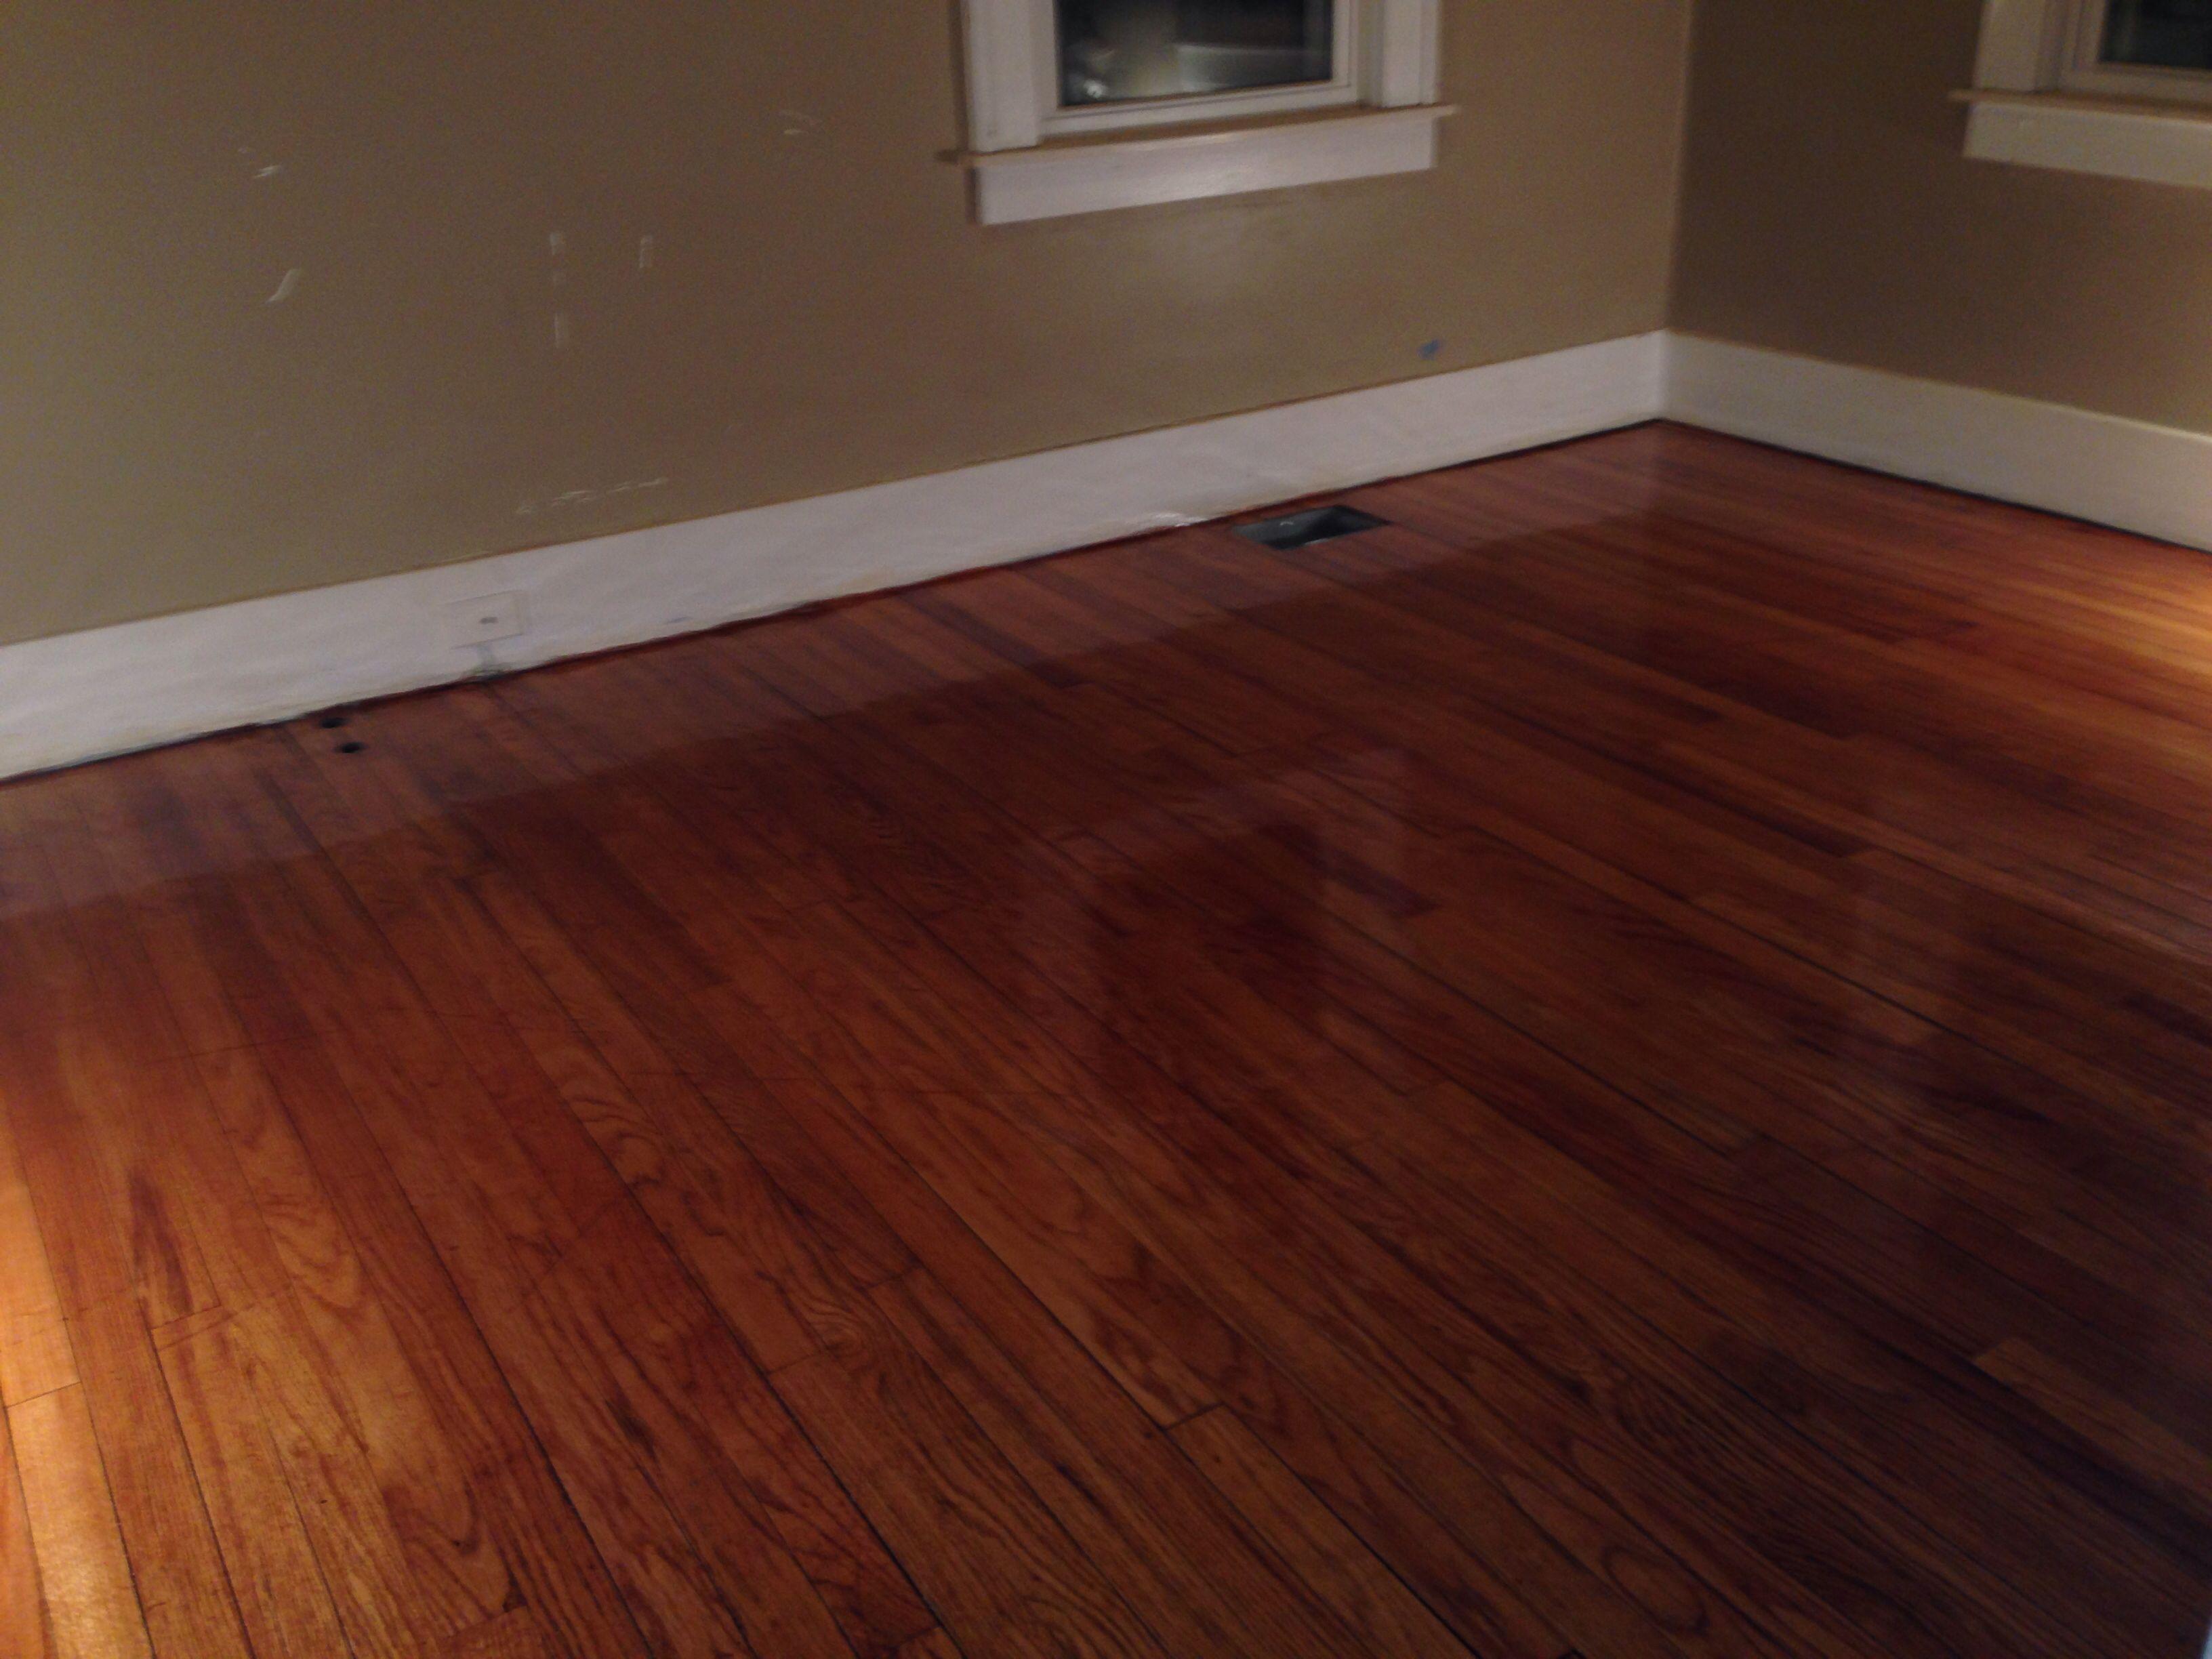 Sanding Floors Hardwood Restore Without